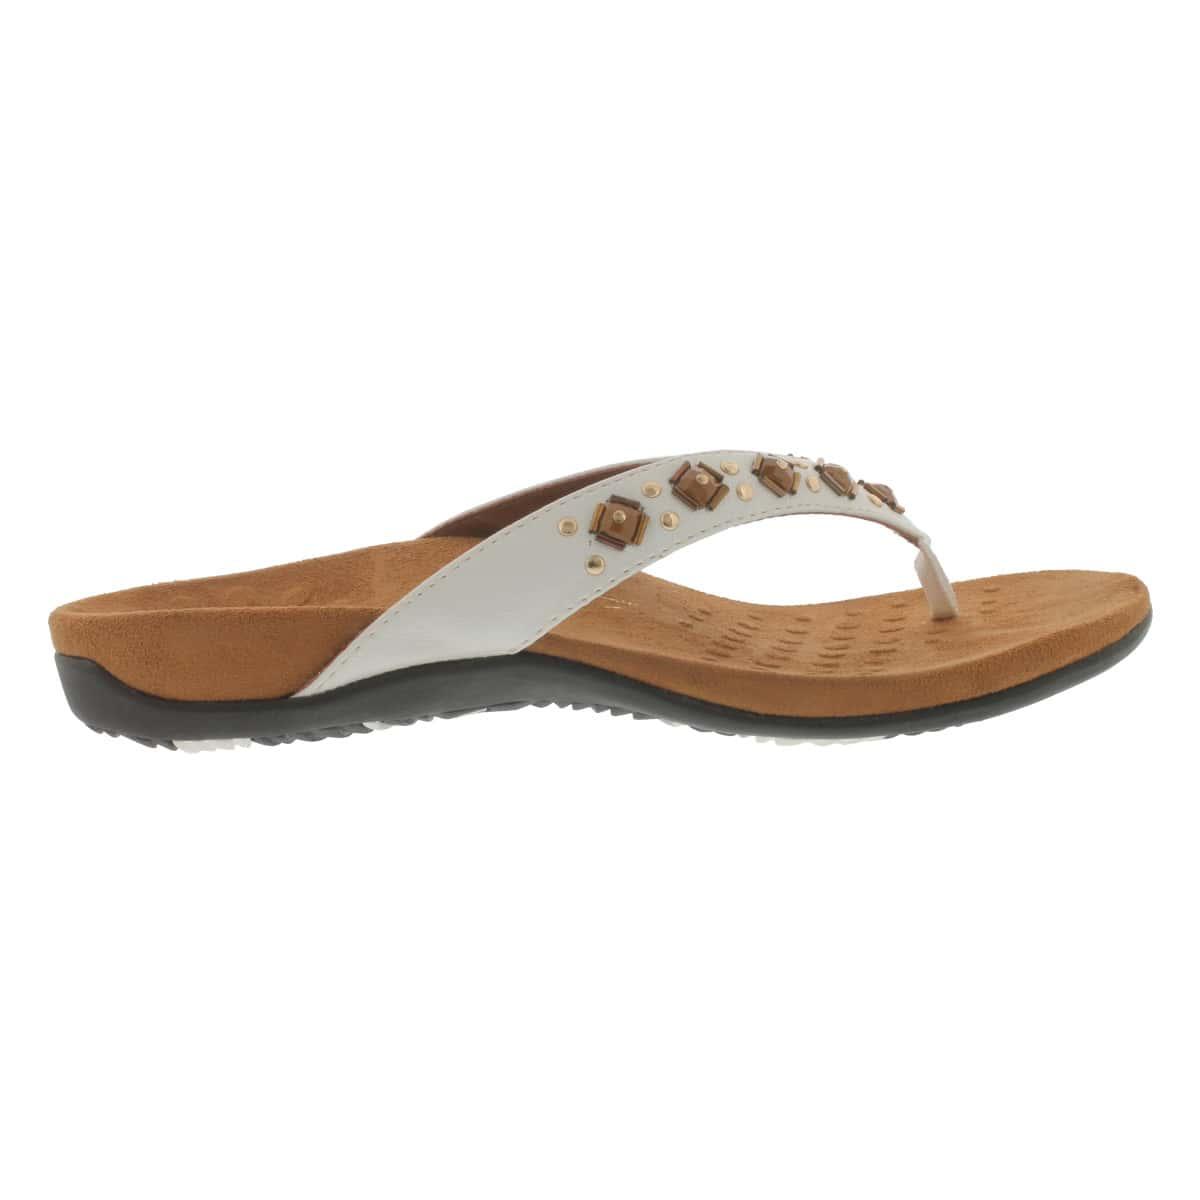 Sandale tong blanc FLORIANA, fem